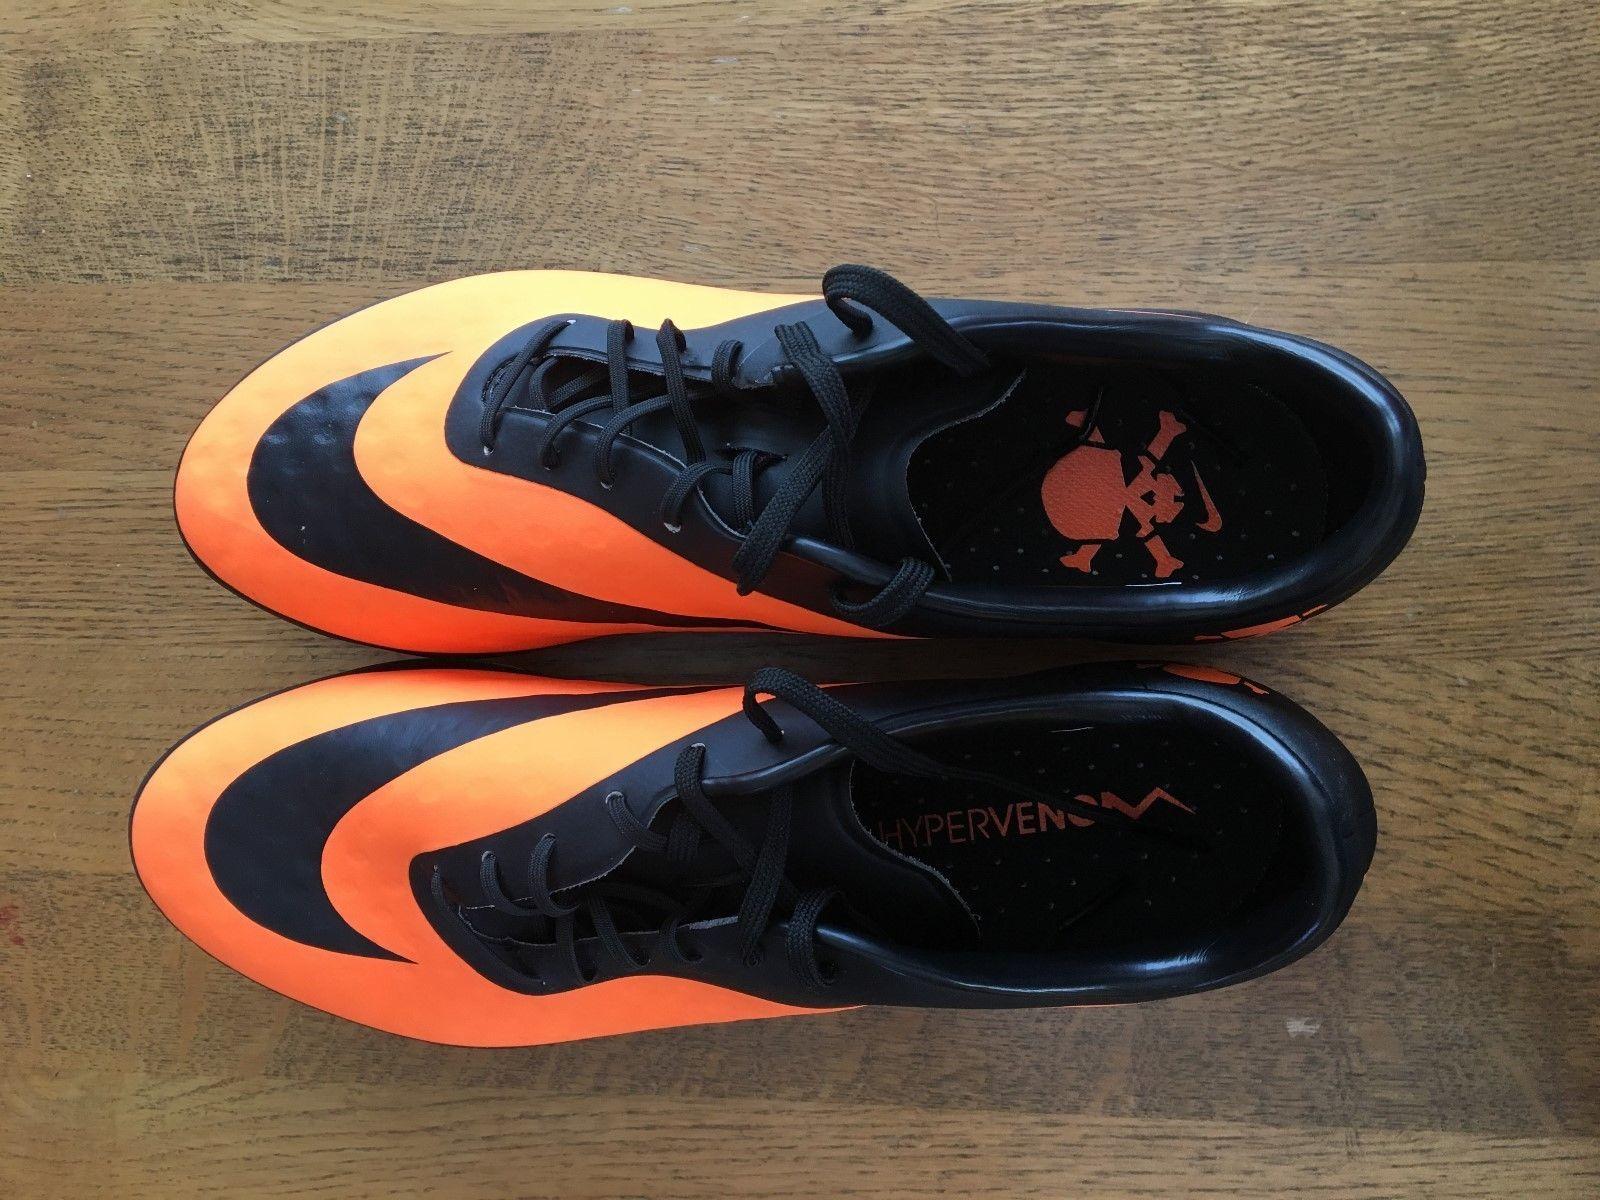 b8e593c740e Nike Hypervenom Phatal FG Black Bright Citrus 599075 - 008 7.5  119 Retail  -  59.99 · Advanced search for Nike Soccer Shoes 008